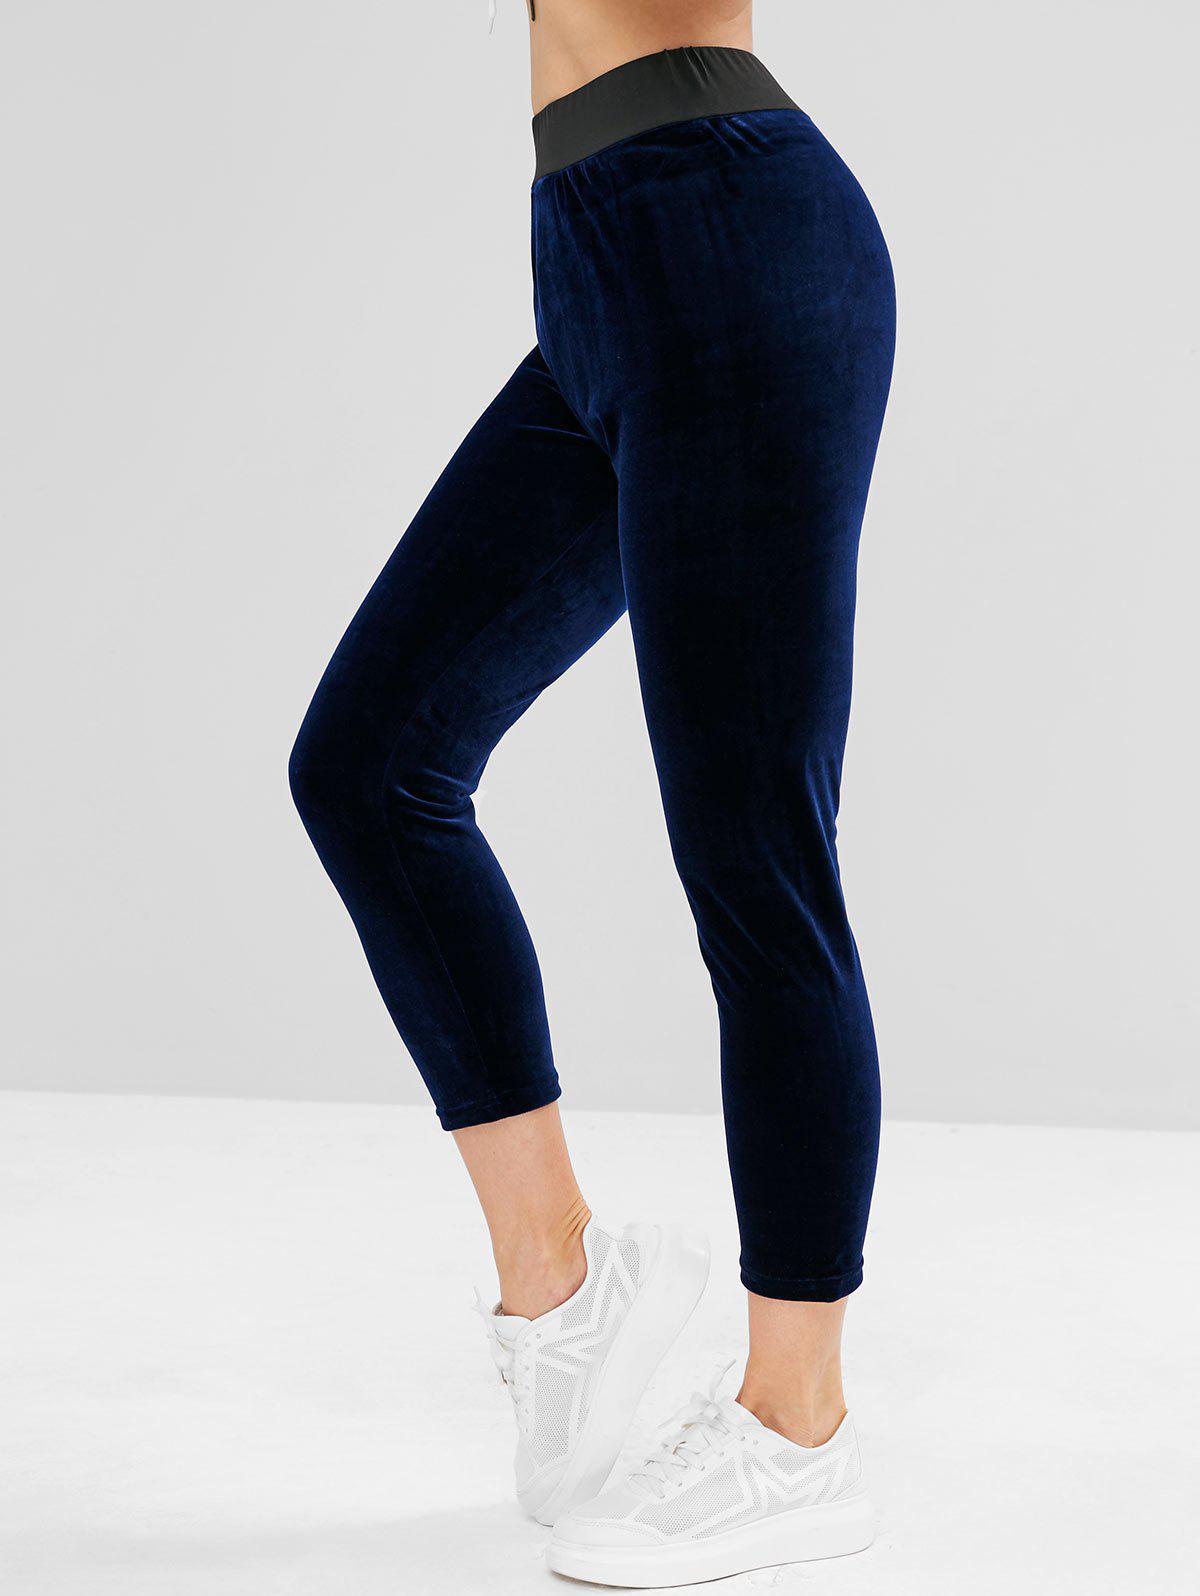 ZAFUL Velours Taille Haute pantalon en Molleton